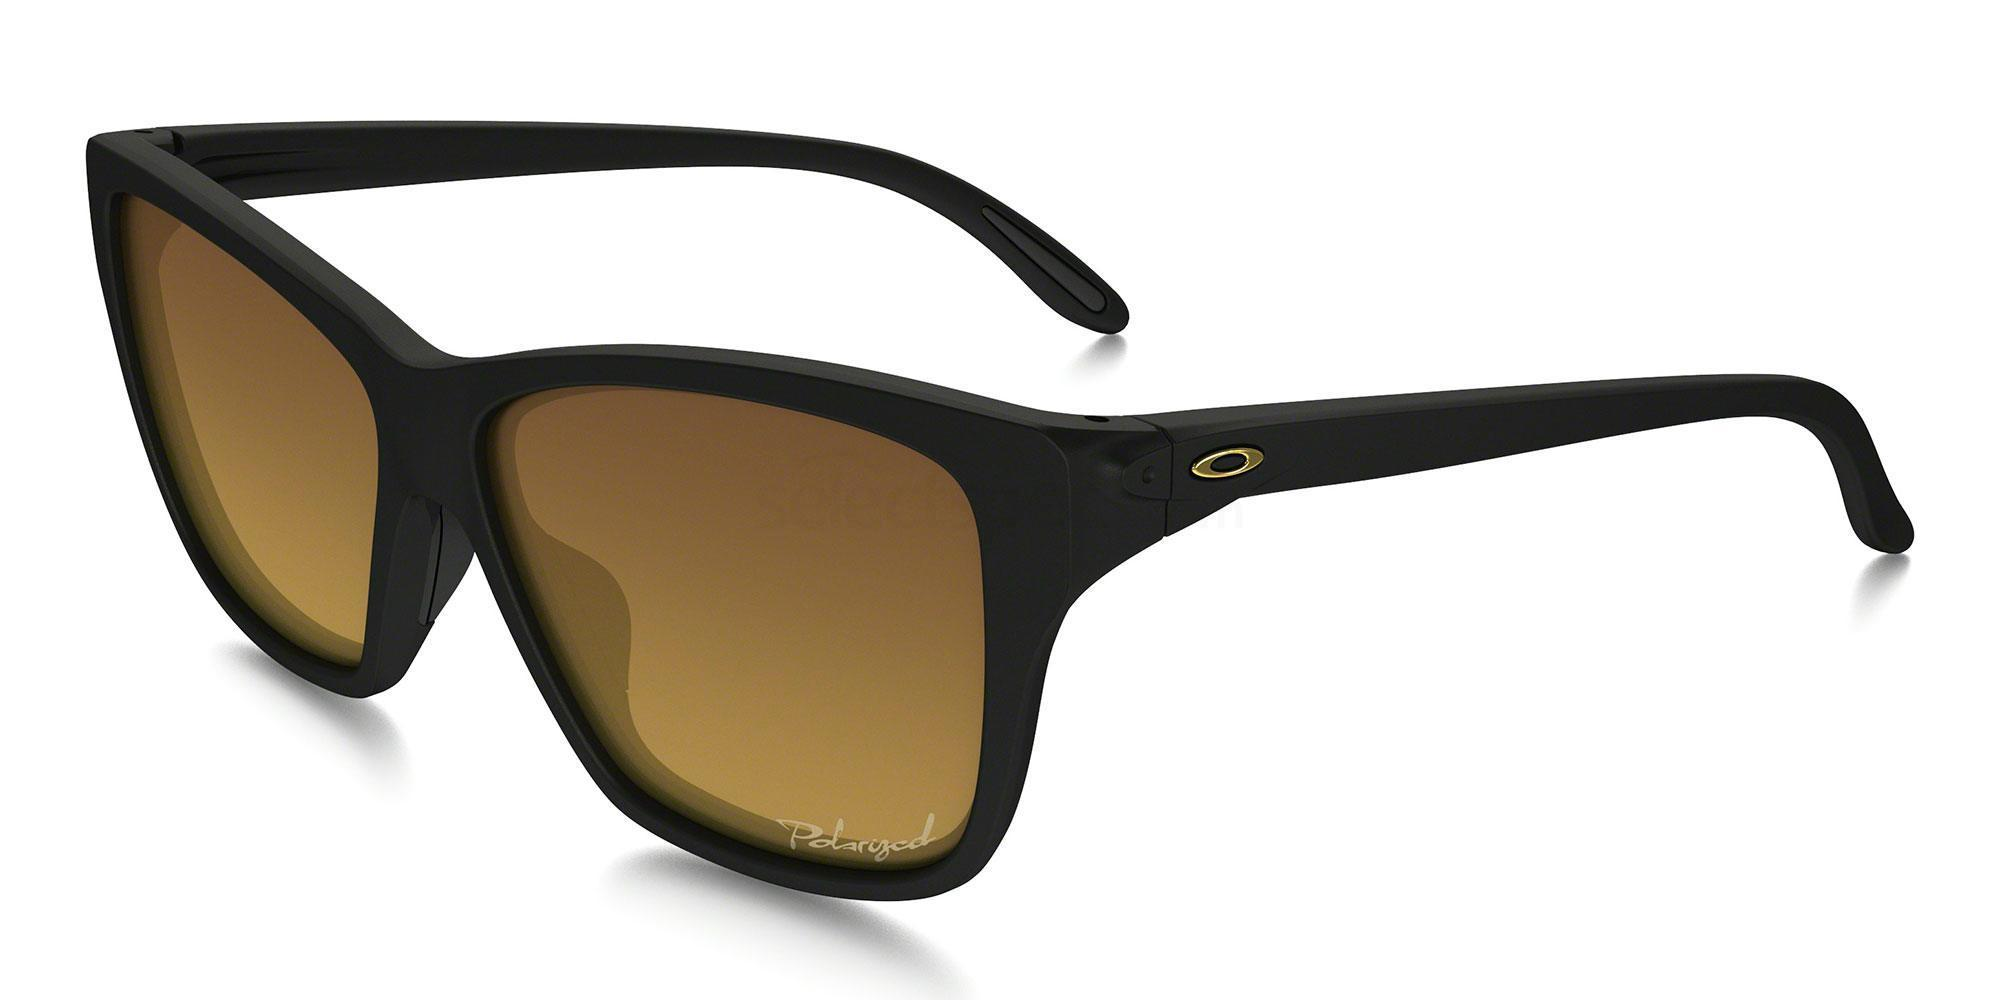 929801 OO9298 HOLD ON (Polarized) Sunglasses, Oakley Ladies